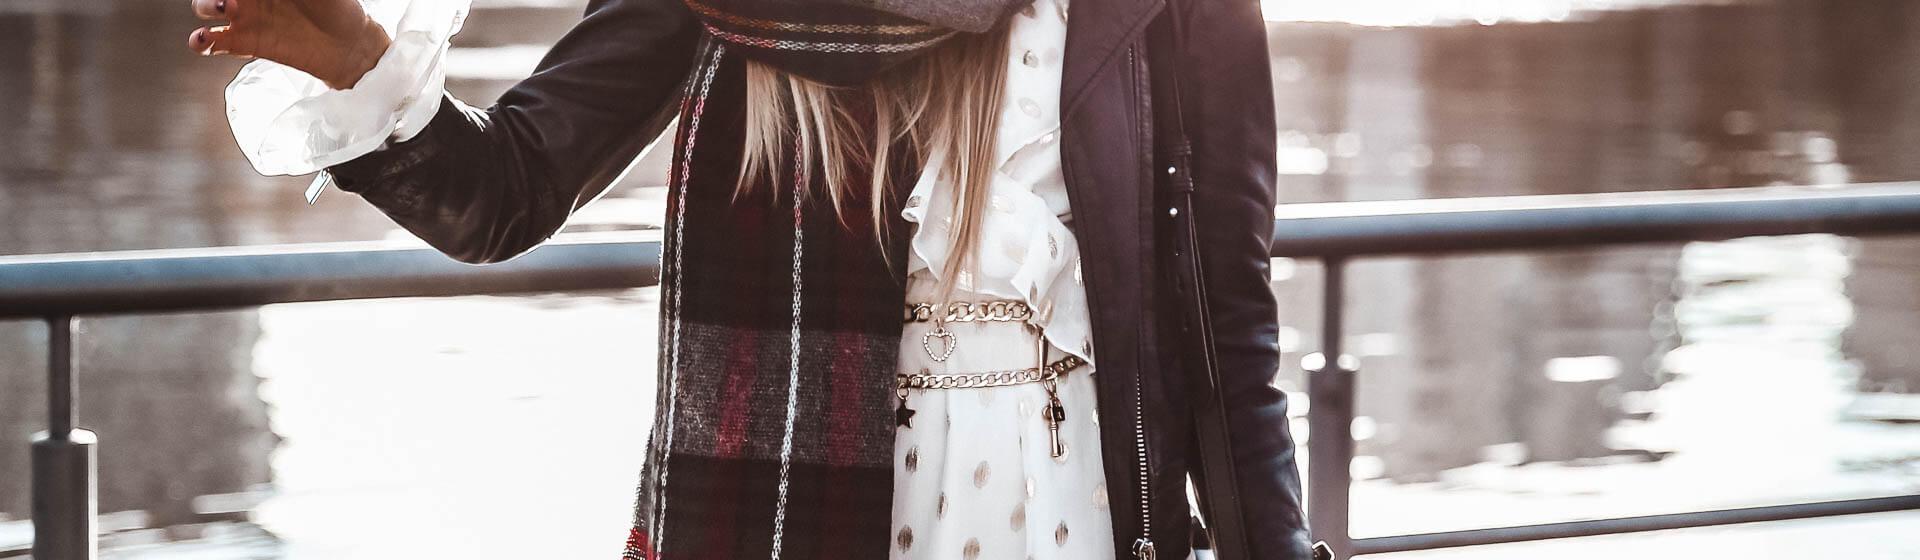 Kettengürtel zu Kleid kombinieren